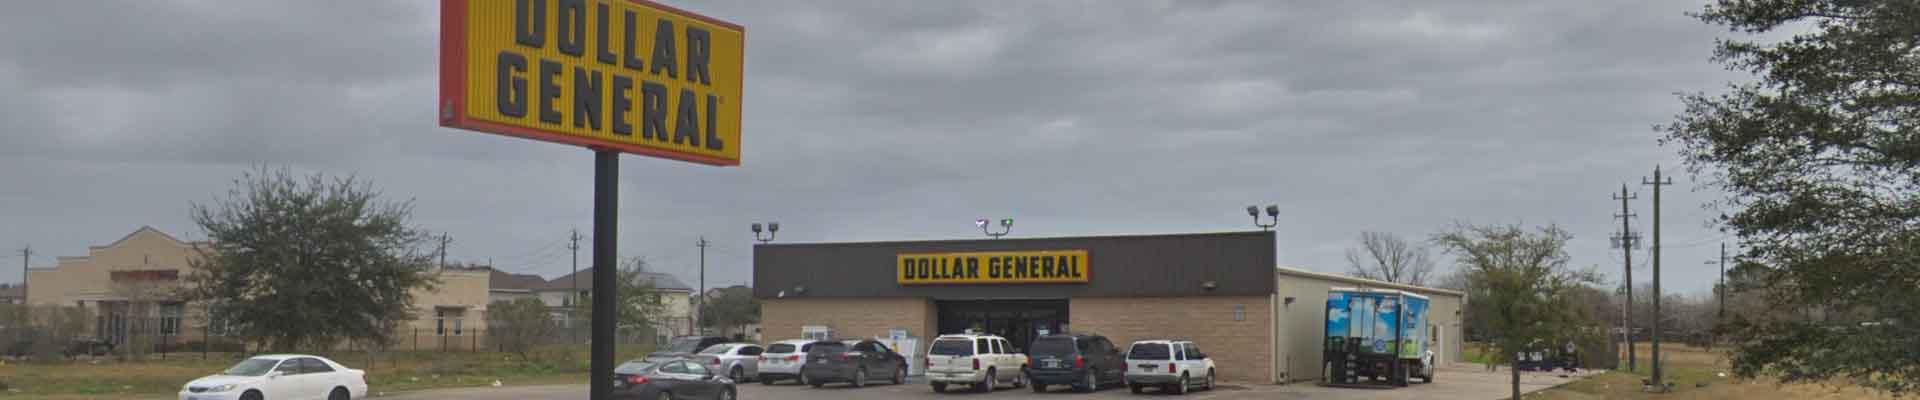 Dollar General (7503) – Houston, Texas